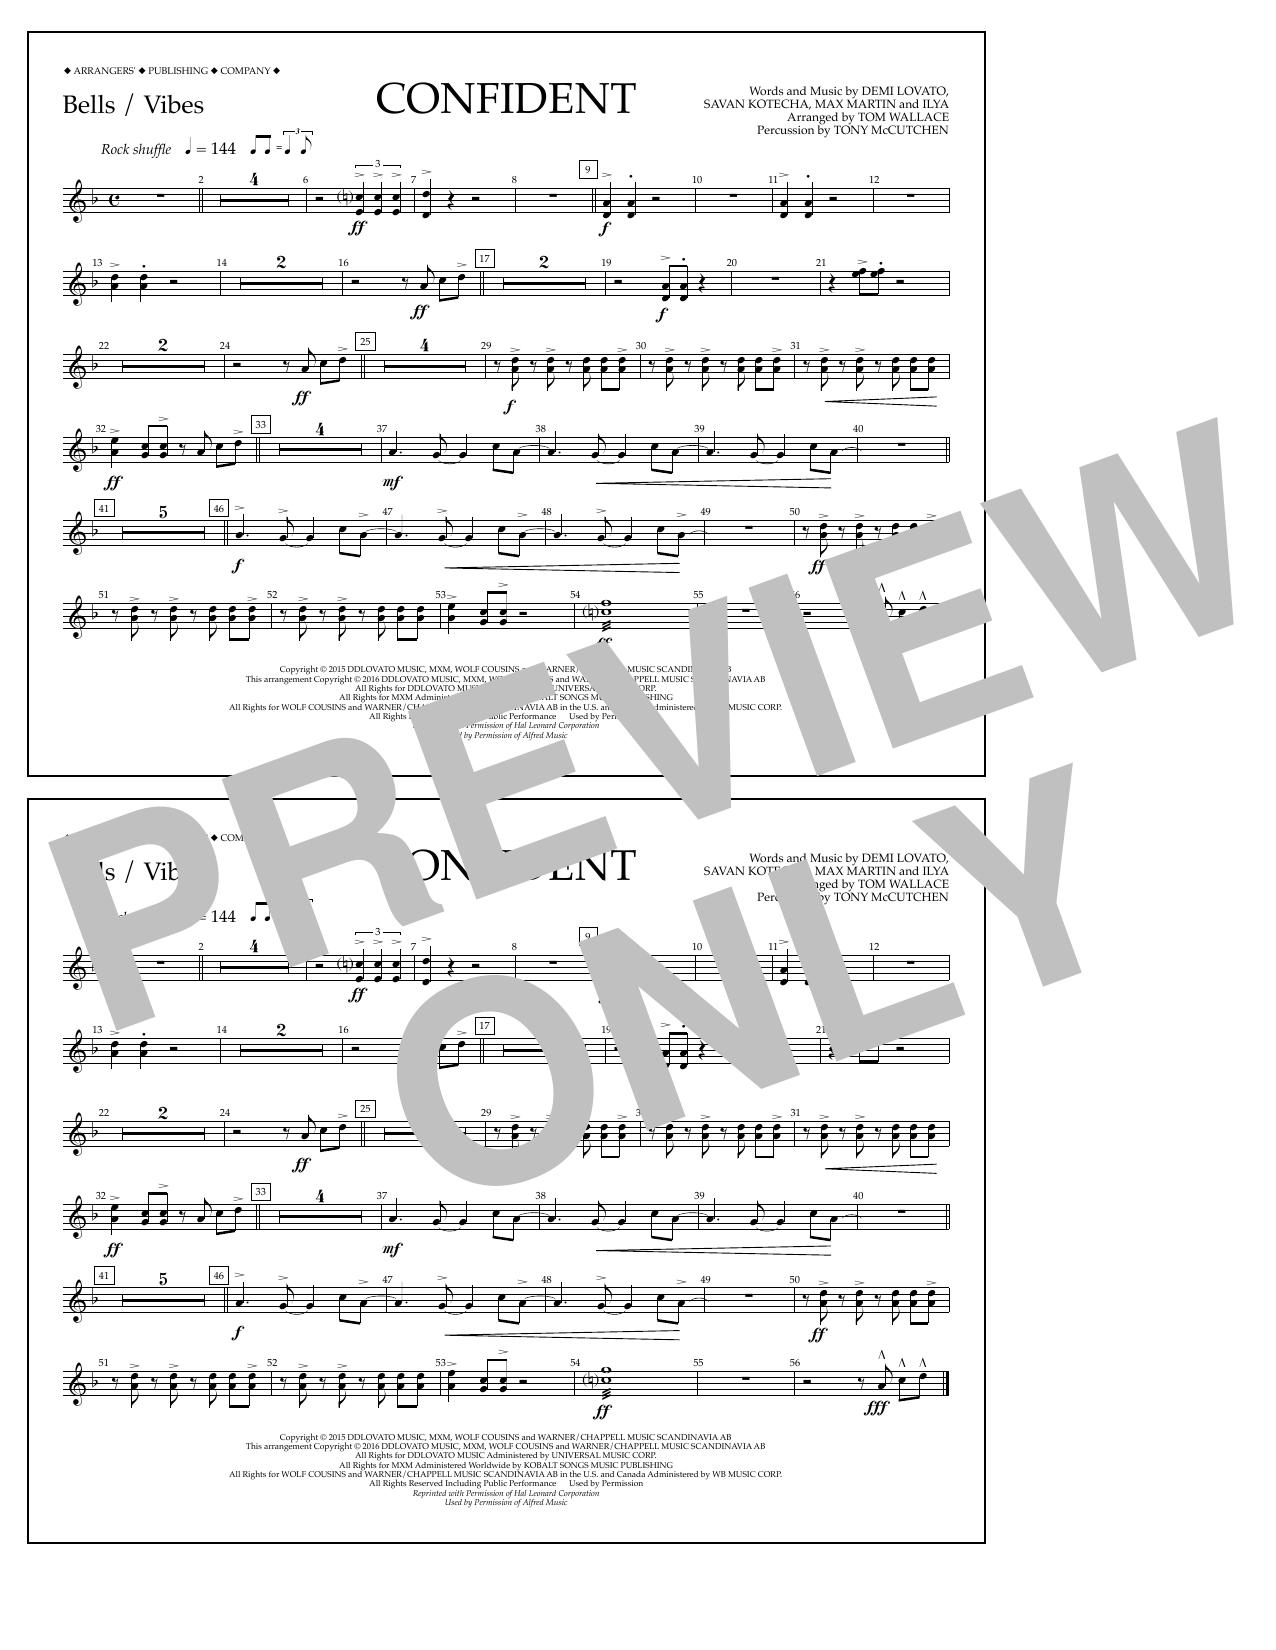 Sheet music digital files to print licensed demi lovato digital confident bellsvibes hexwebz Images